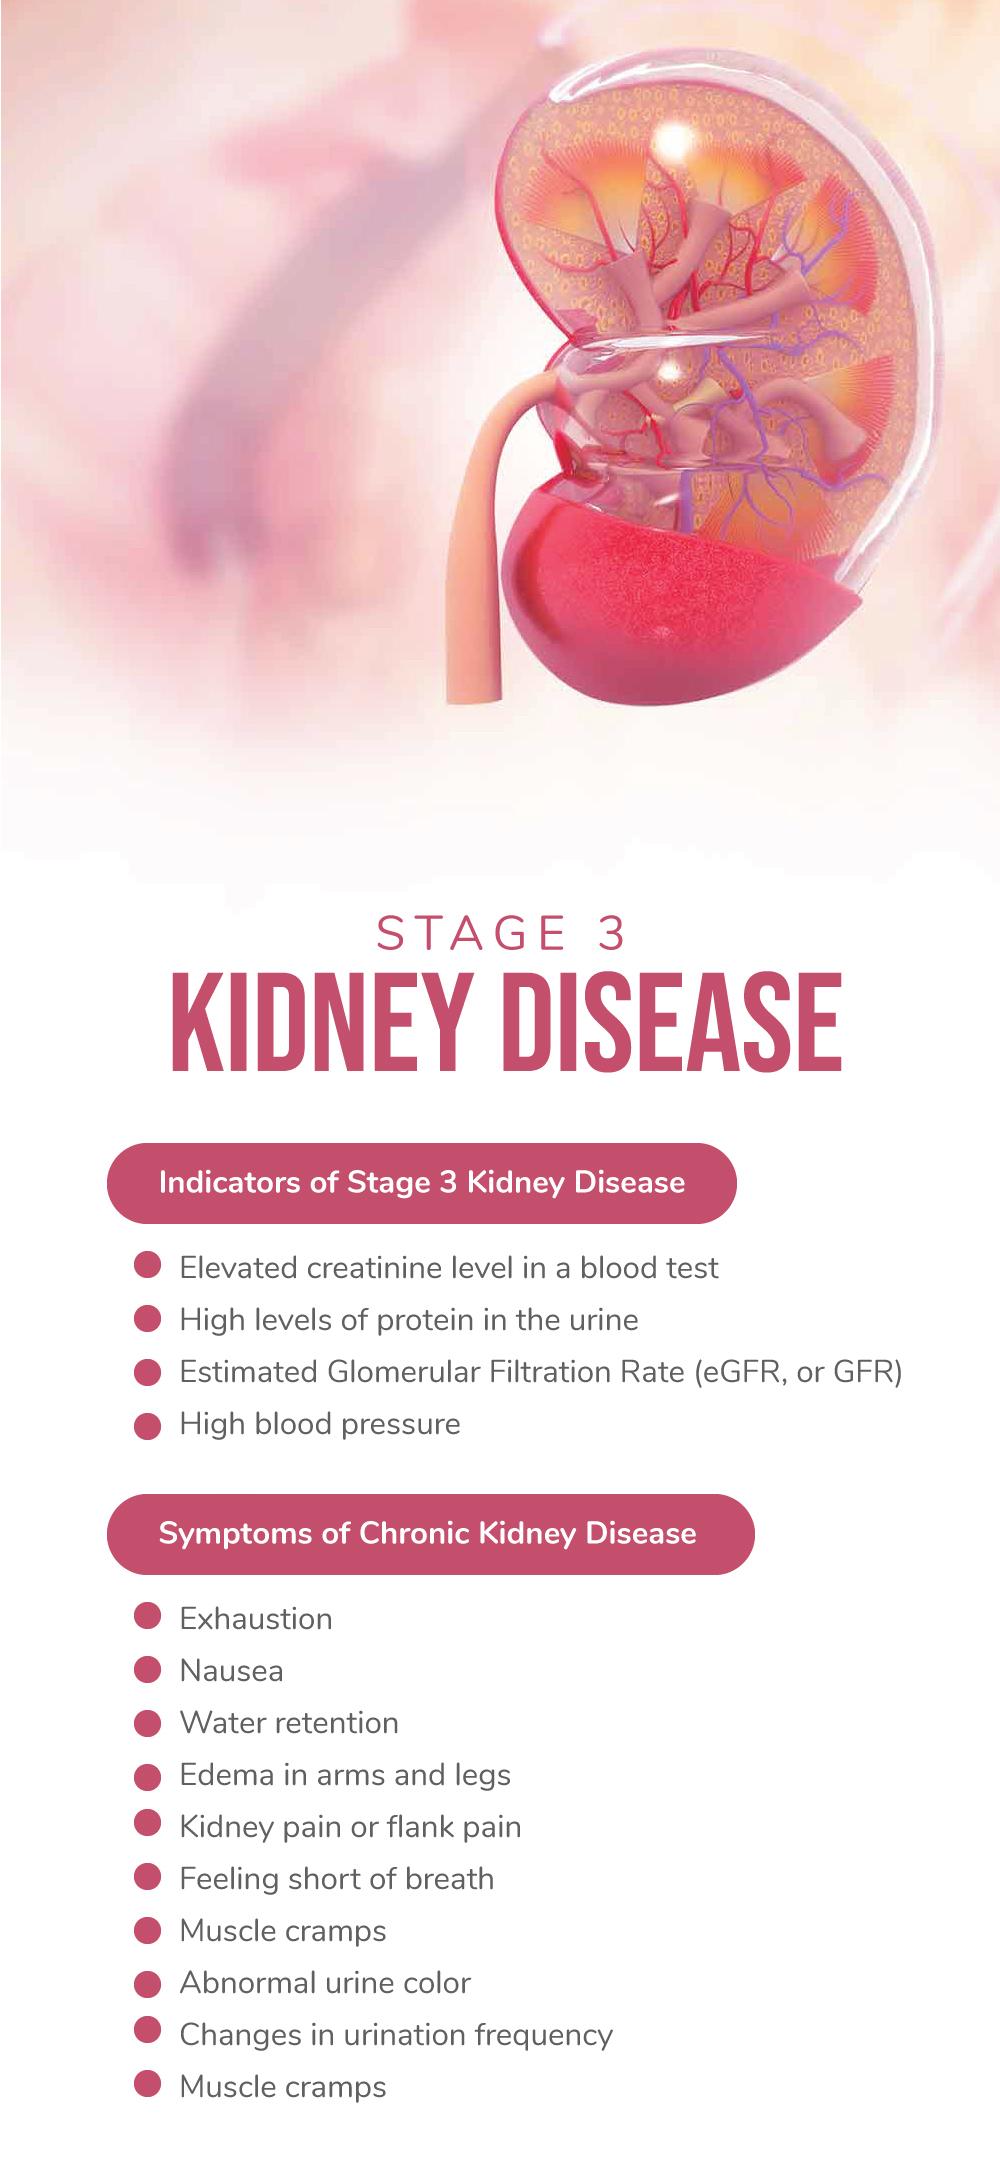 Indicators of Stage 3 Kidney Disease and Symptoms of Chronic Kidney Disease